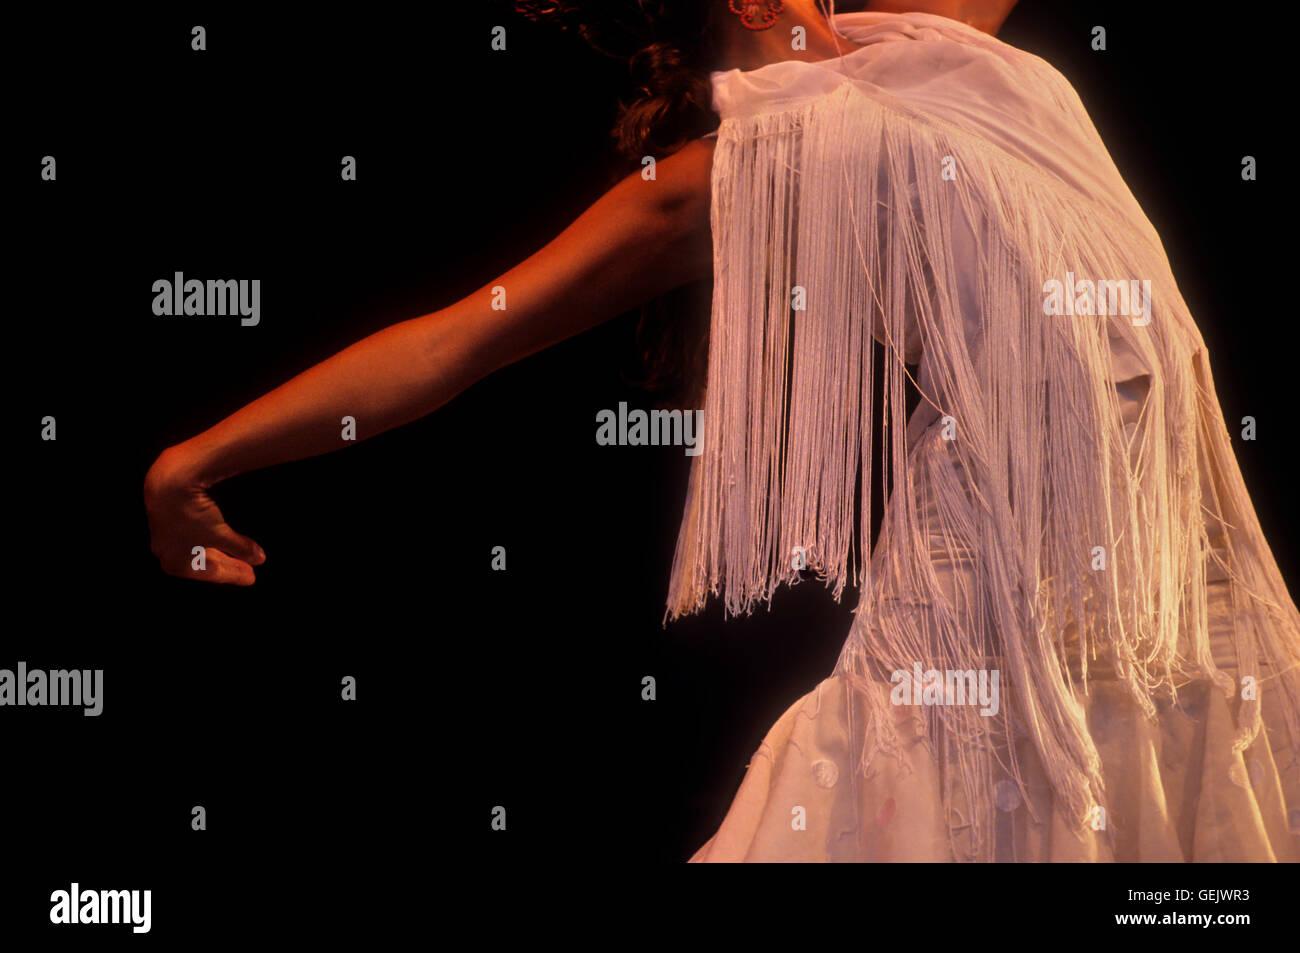 María José Franco.Flamenco dancer.Baluarte de la Candelaria. Cádiz, Andalusia, Spain - Stock Image